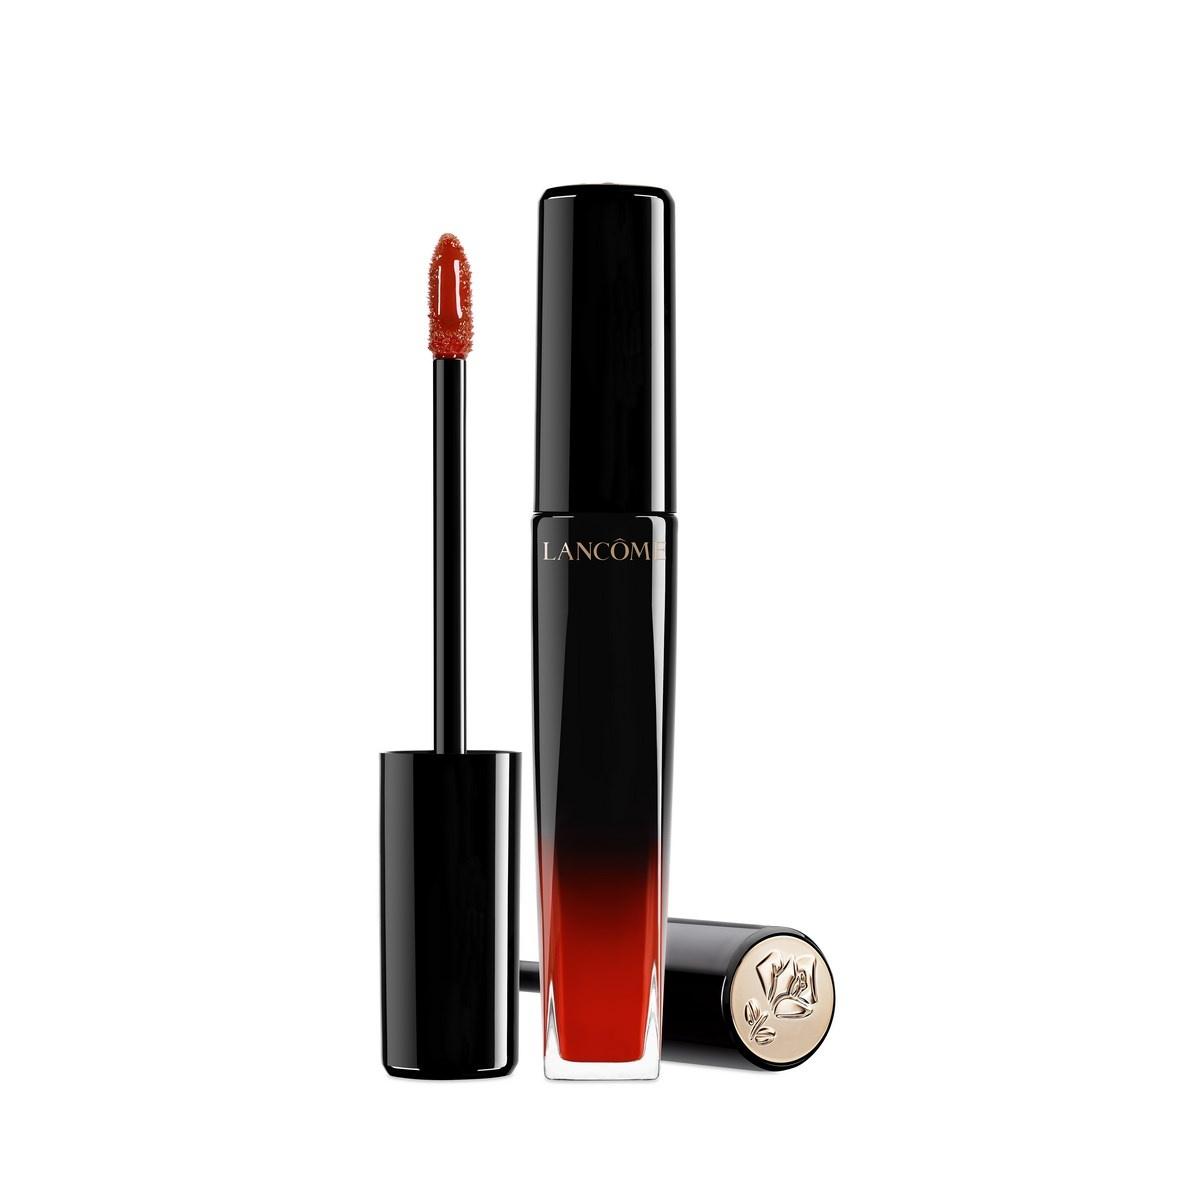 Lancôme L'Absolu Lacquer Lipstick, 515 be happy star shade